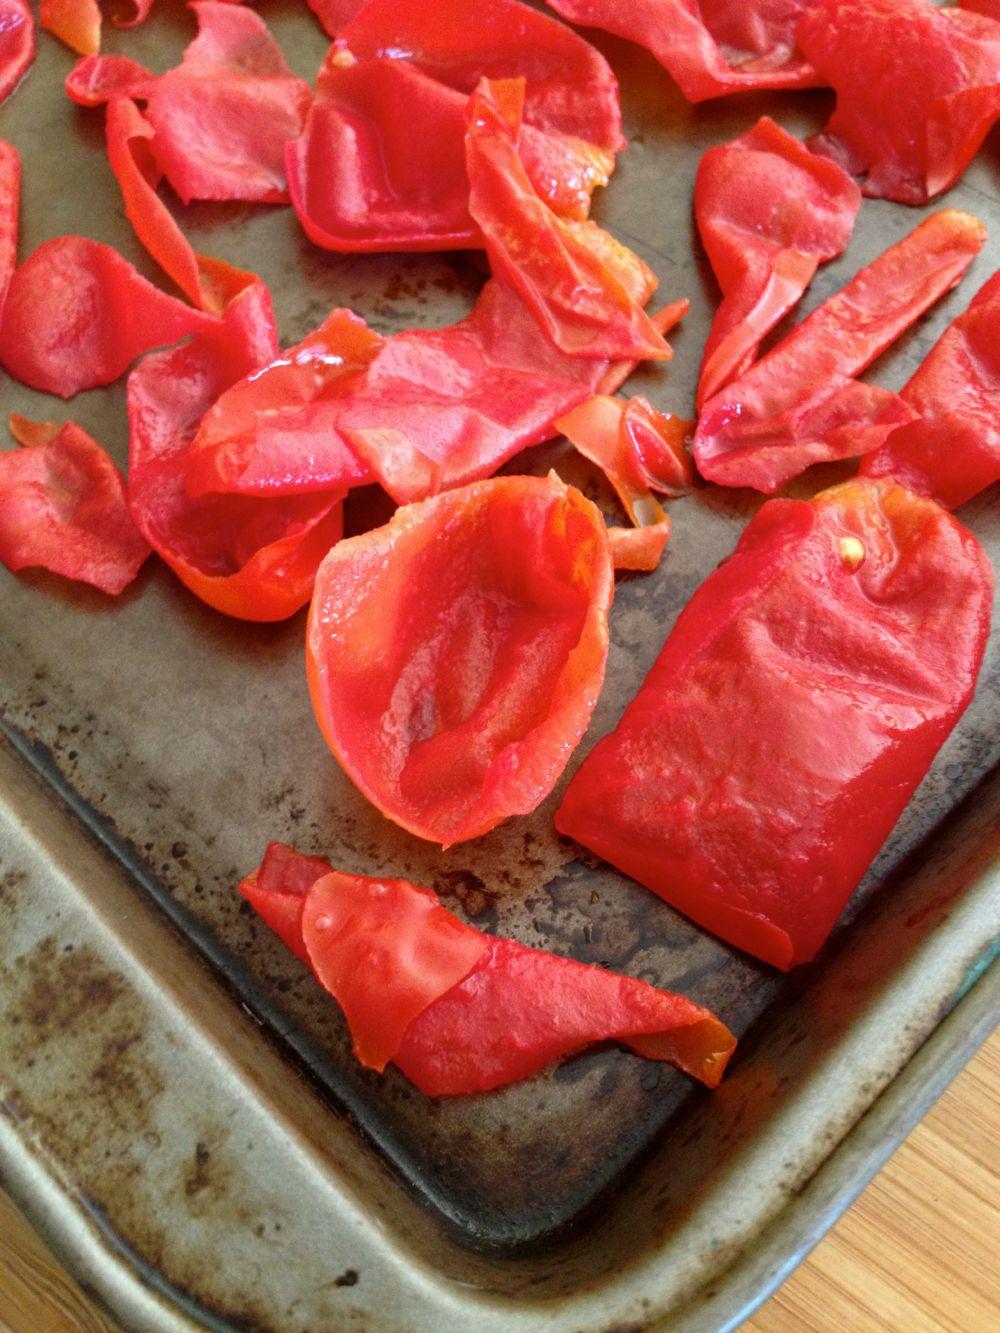 bake tomato skins